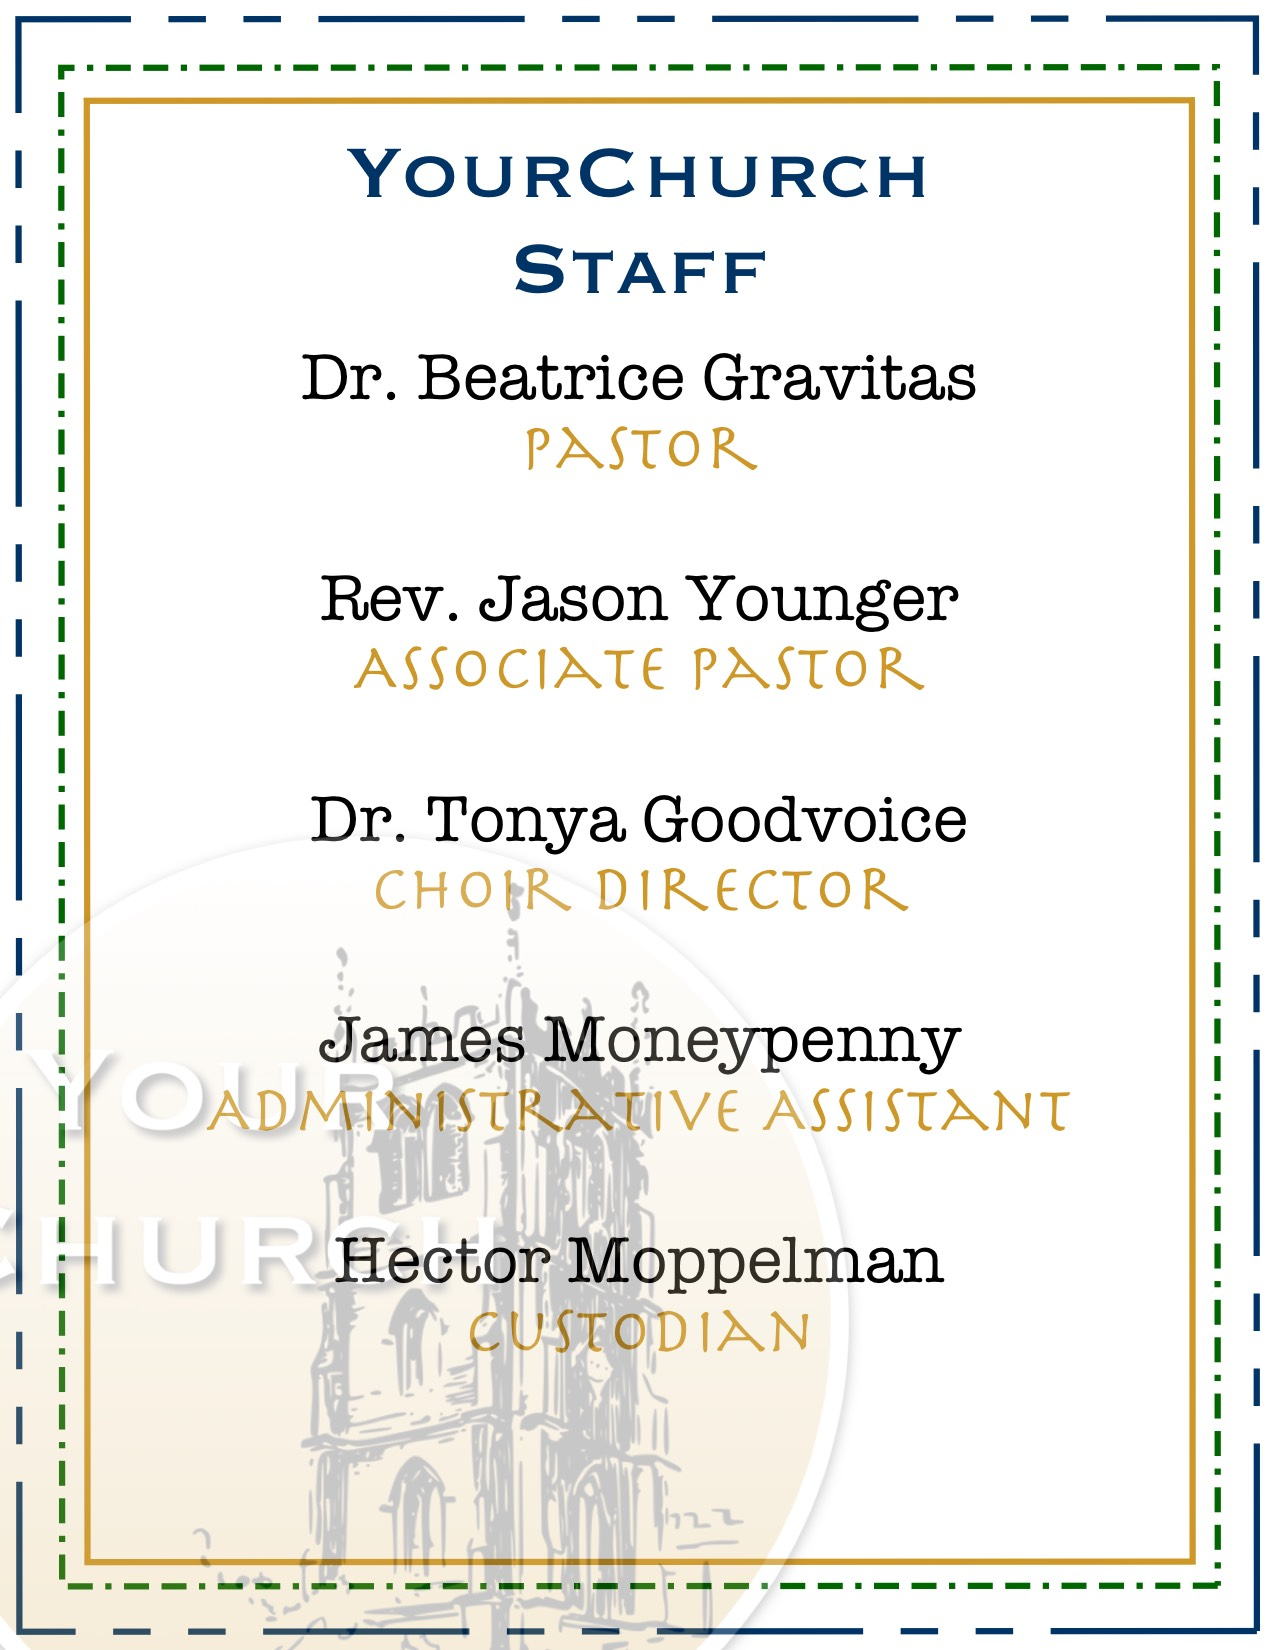 YourChurch Staff List